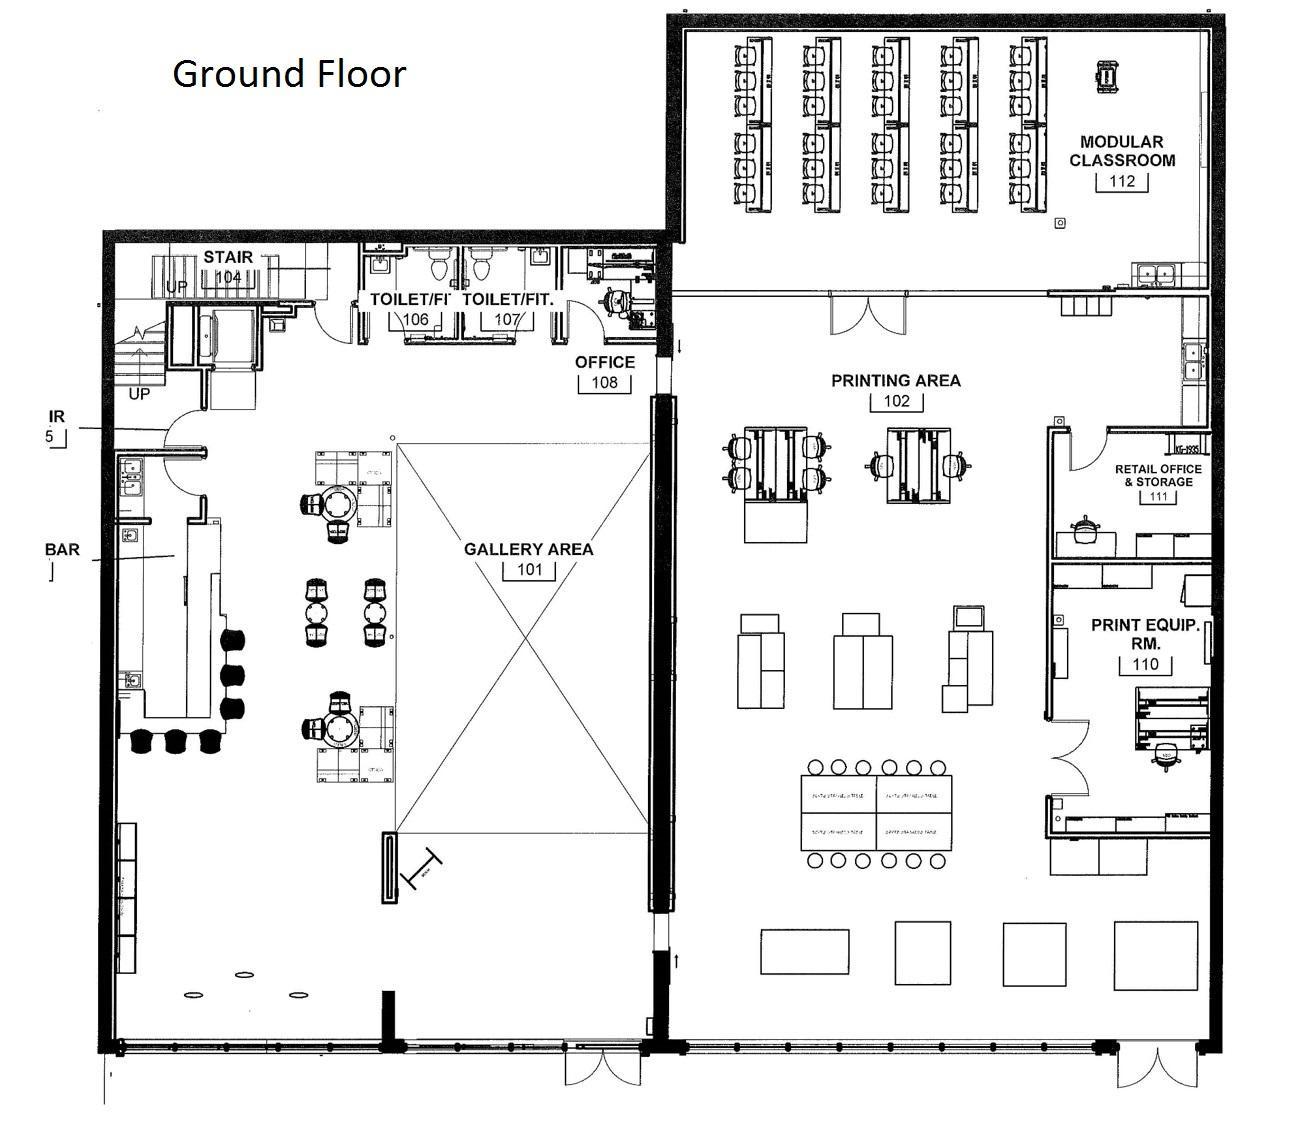 Catapult Creative House To Inspire Entrepreneurship Krcu Diagram Of A Floor Plans For First